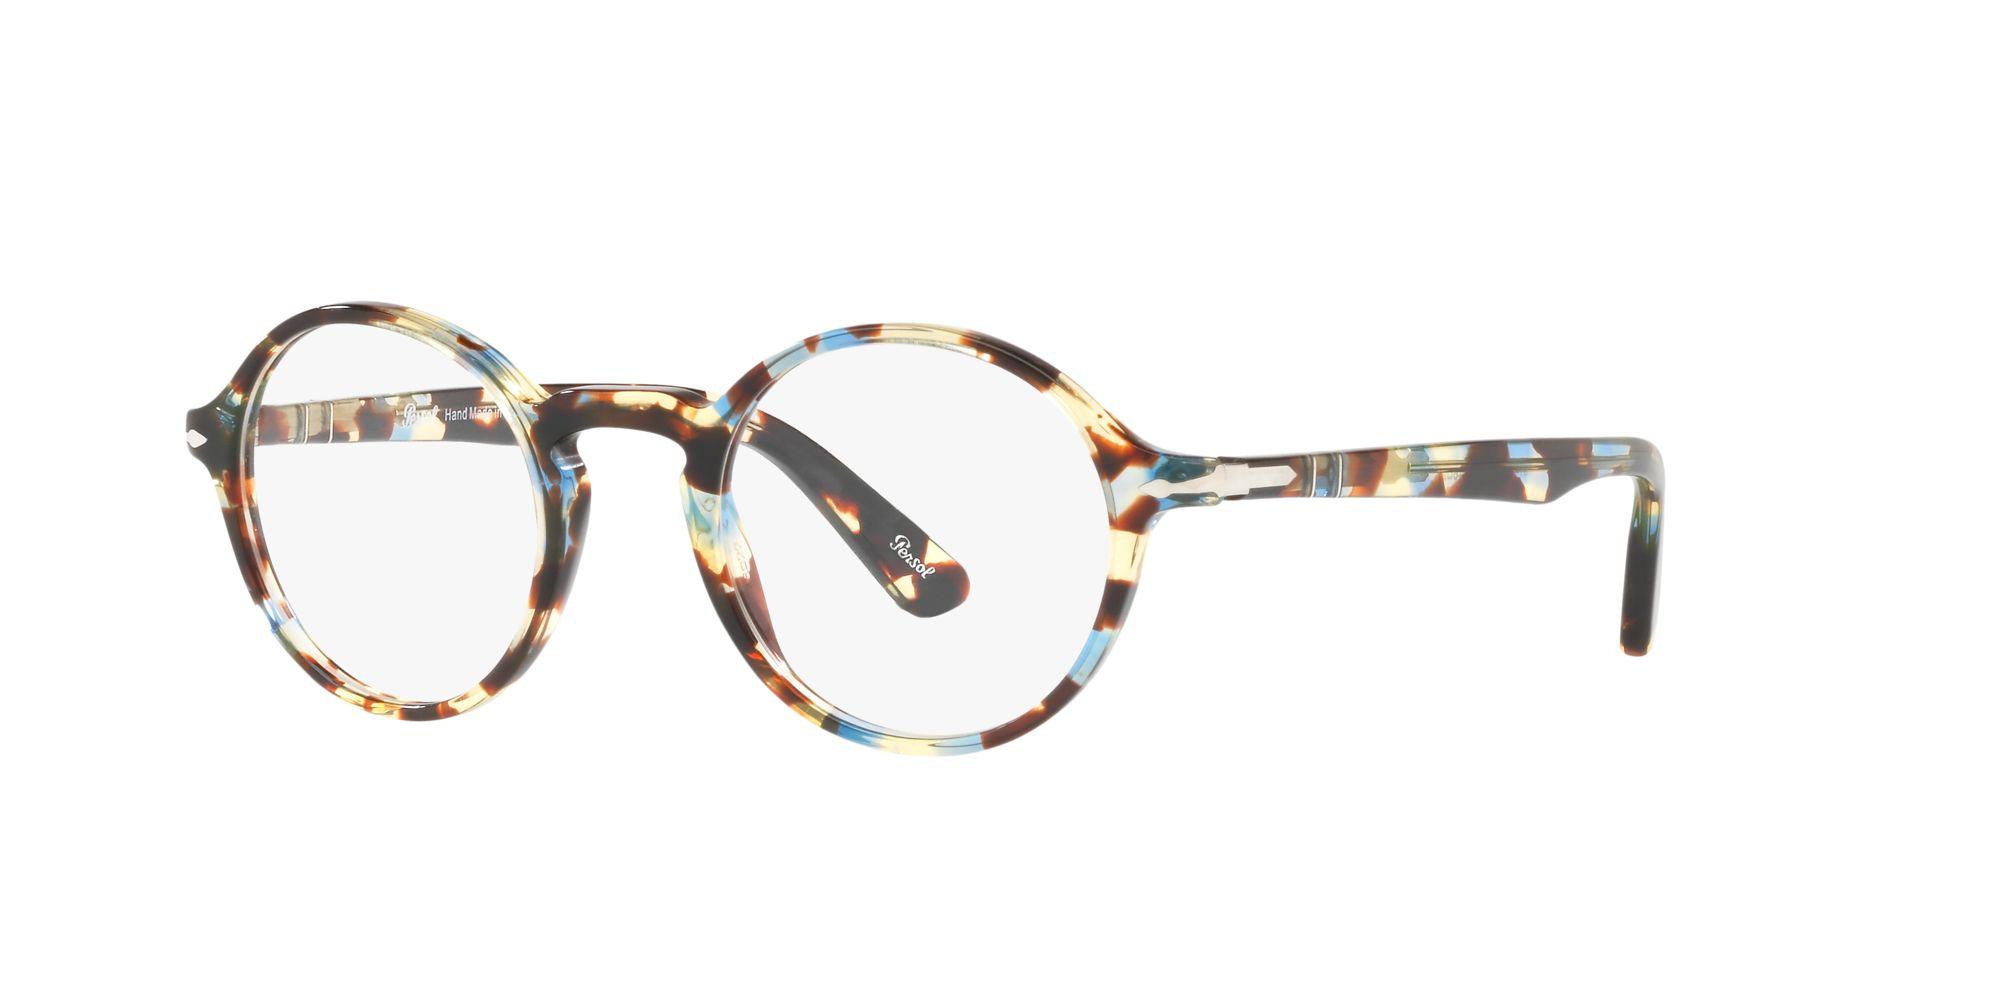 Occhiali da Vista Persol PO3143V GALLERIA 900 1058 15iPI